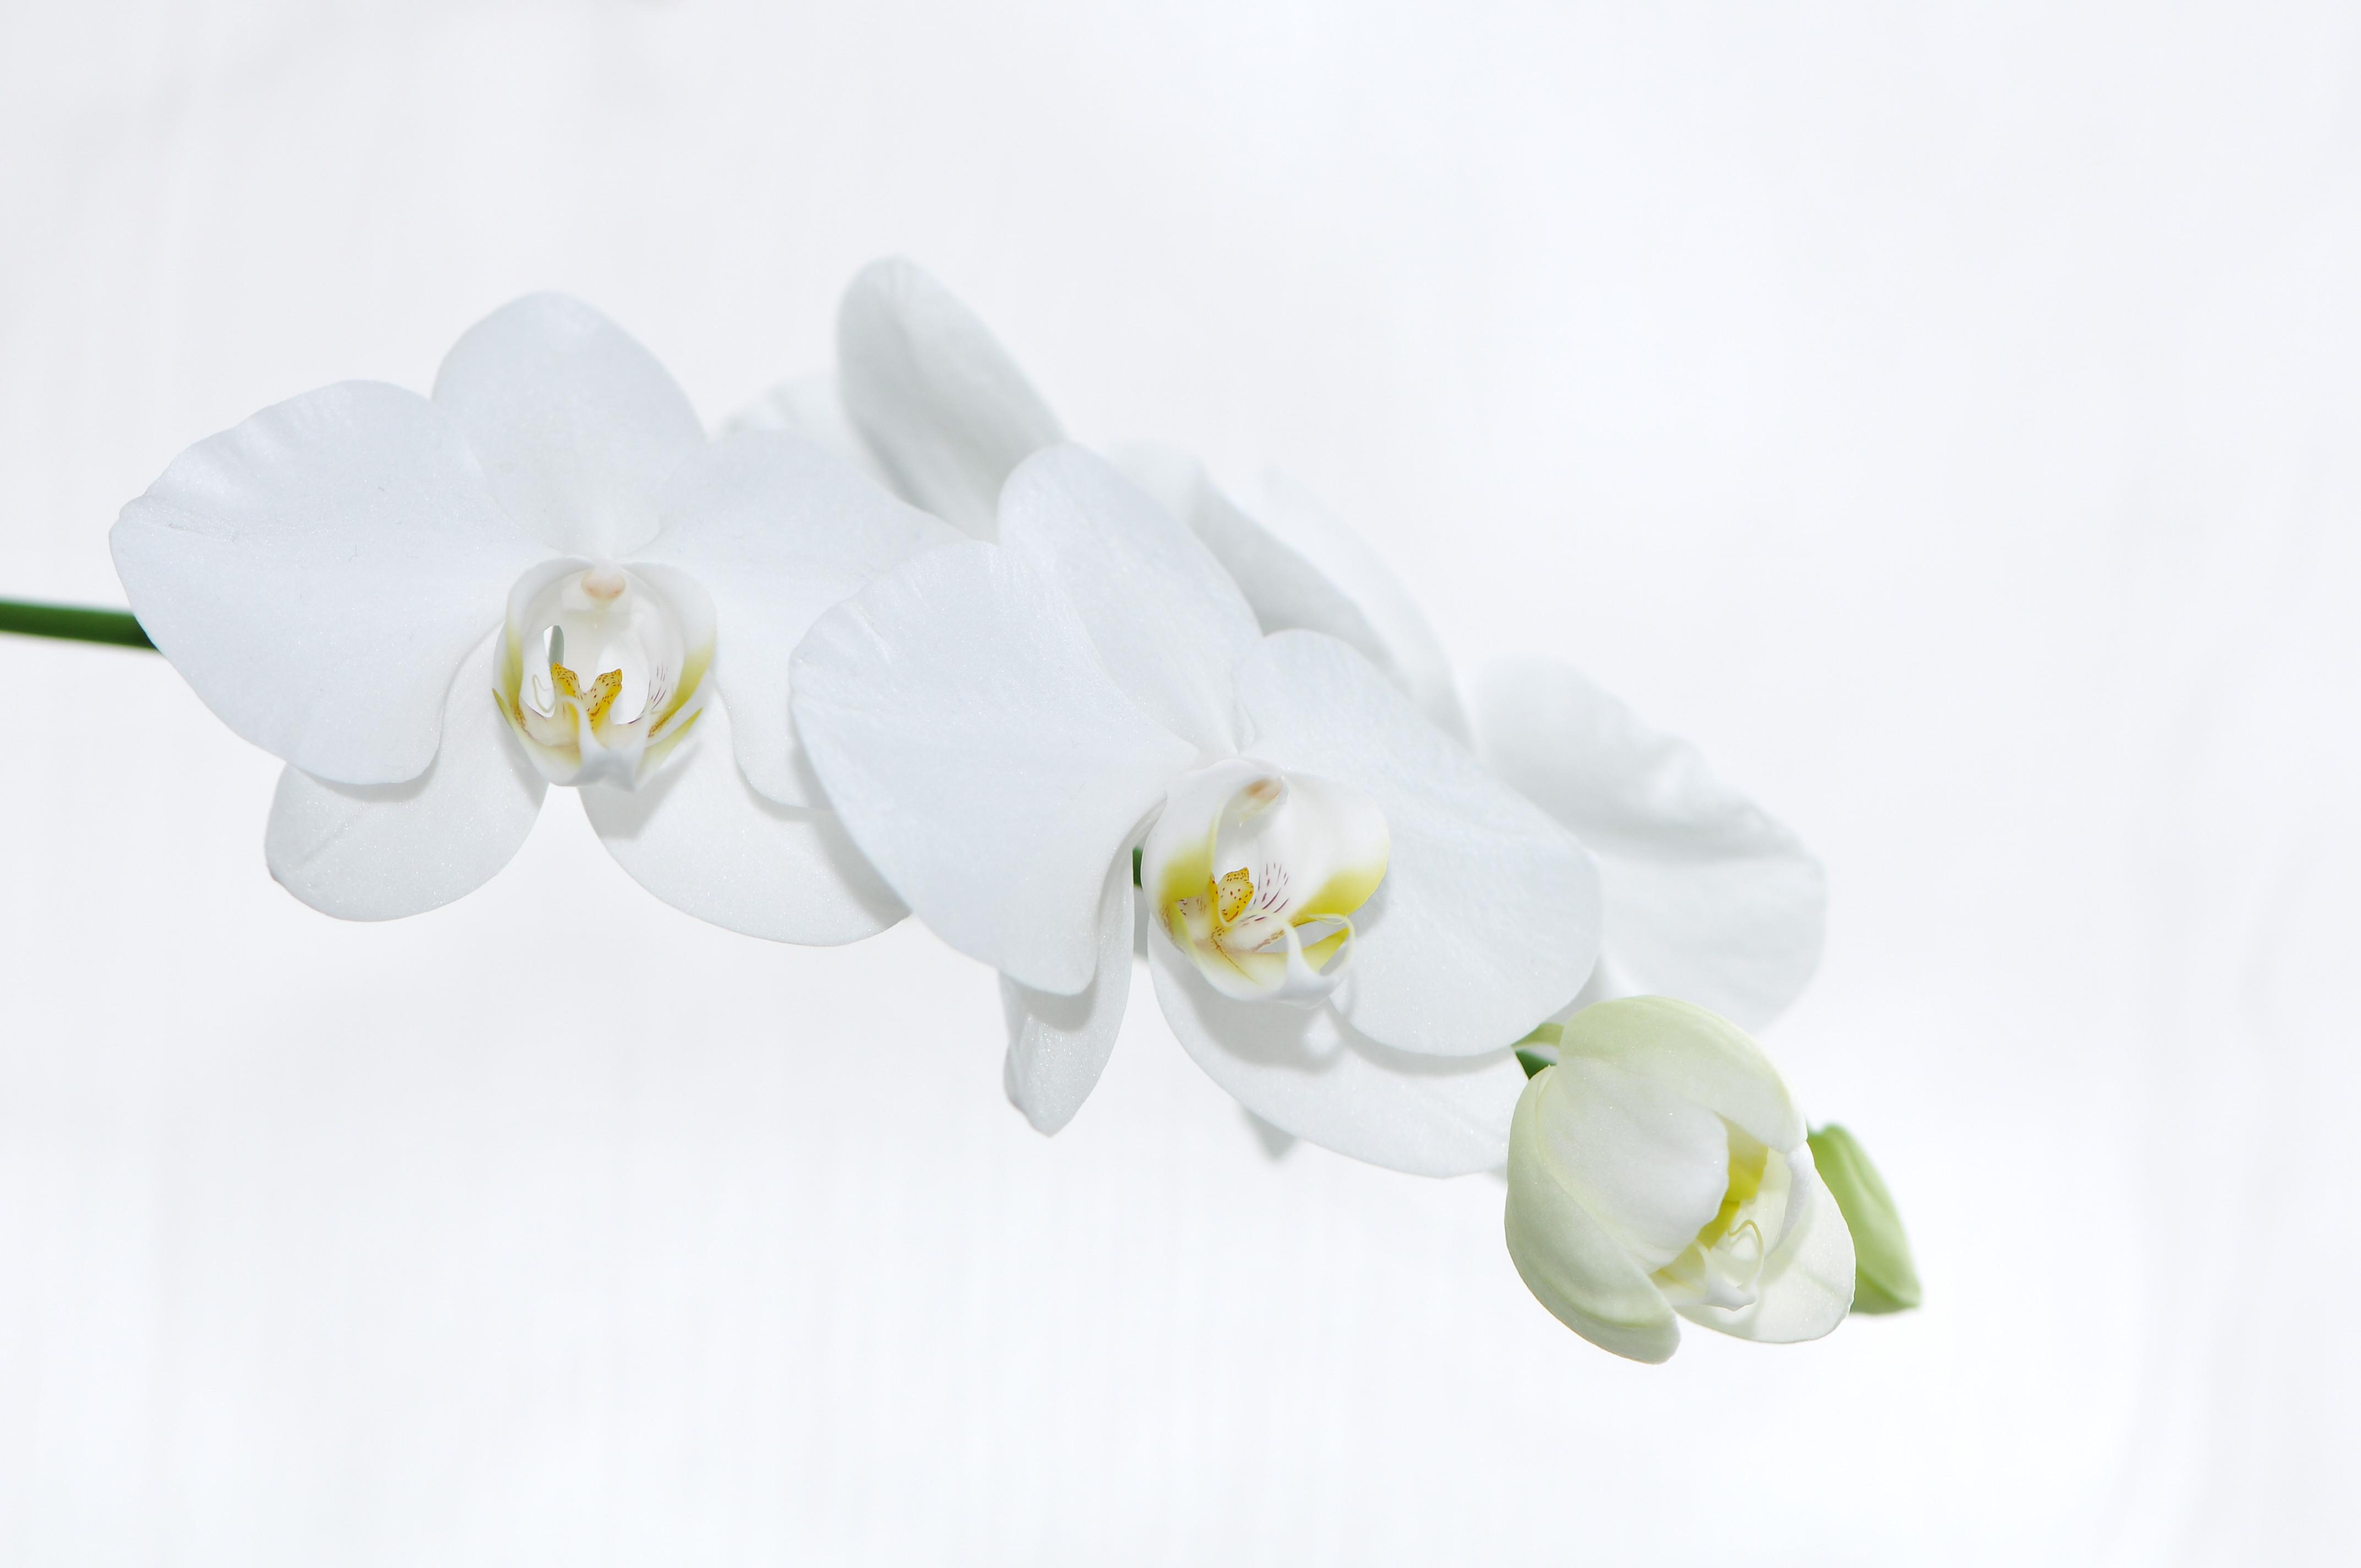 File:Nachtfalter Orchidee, Phalaenopsis 13.JPG - Wikimedia Commons